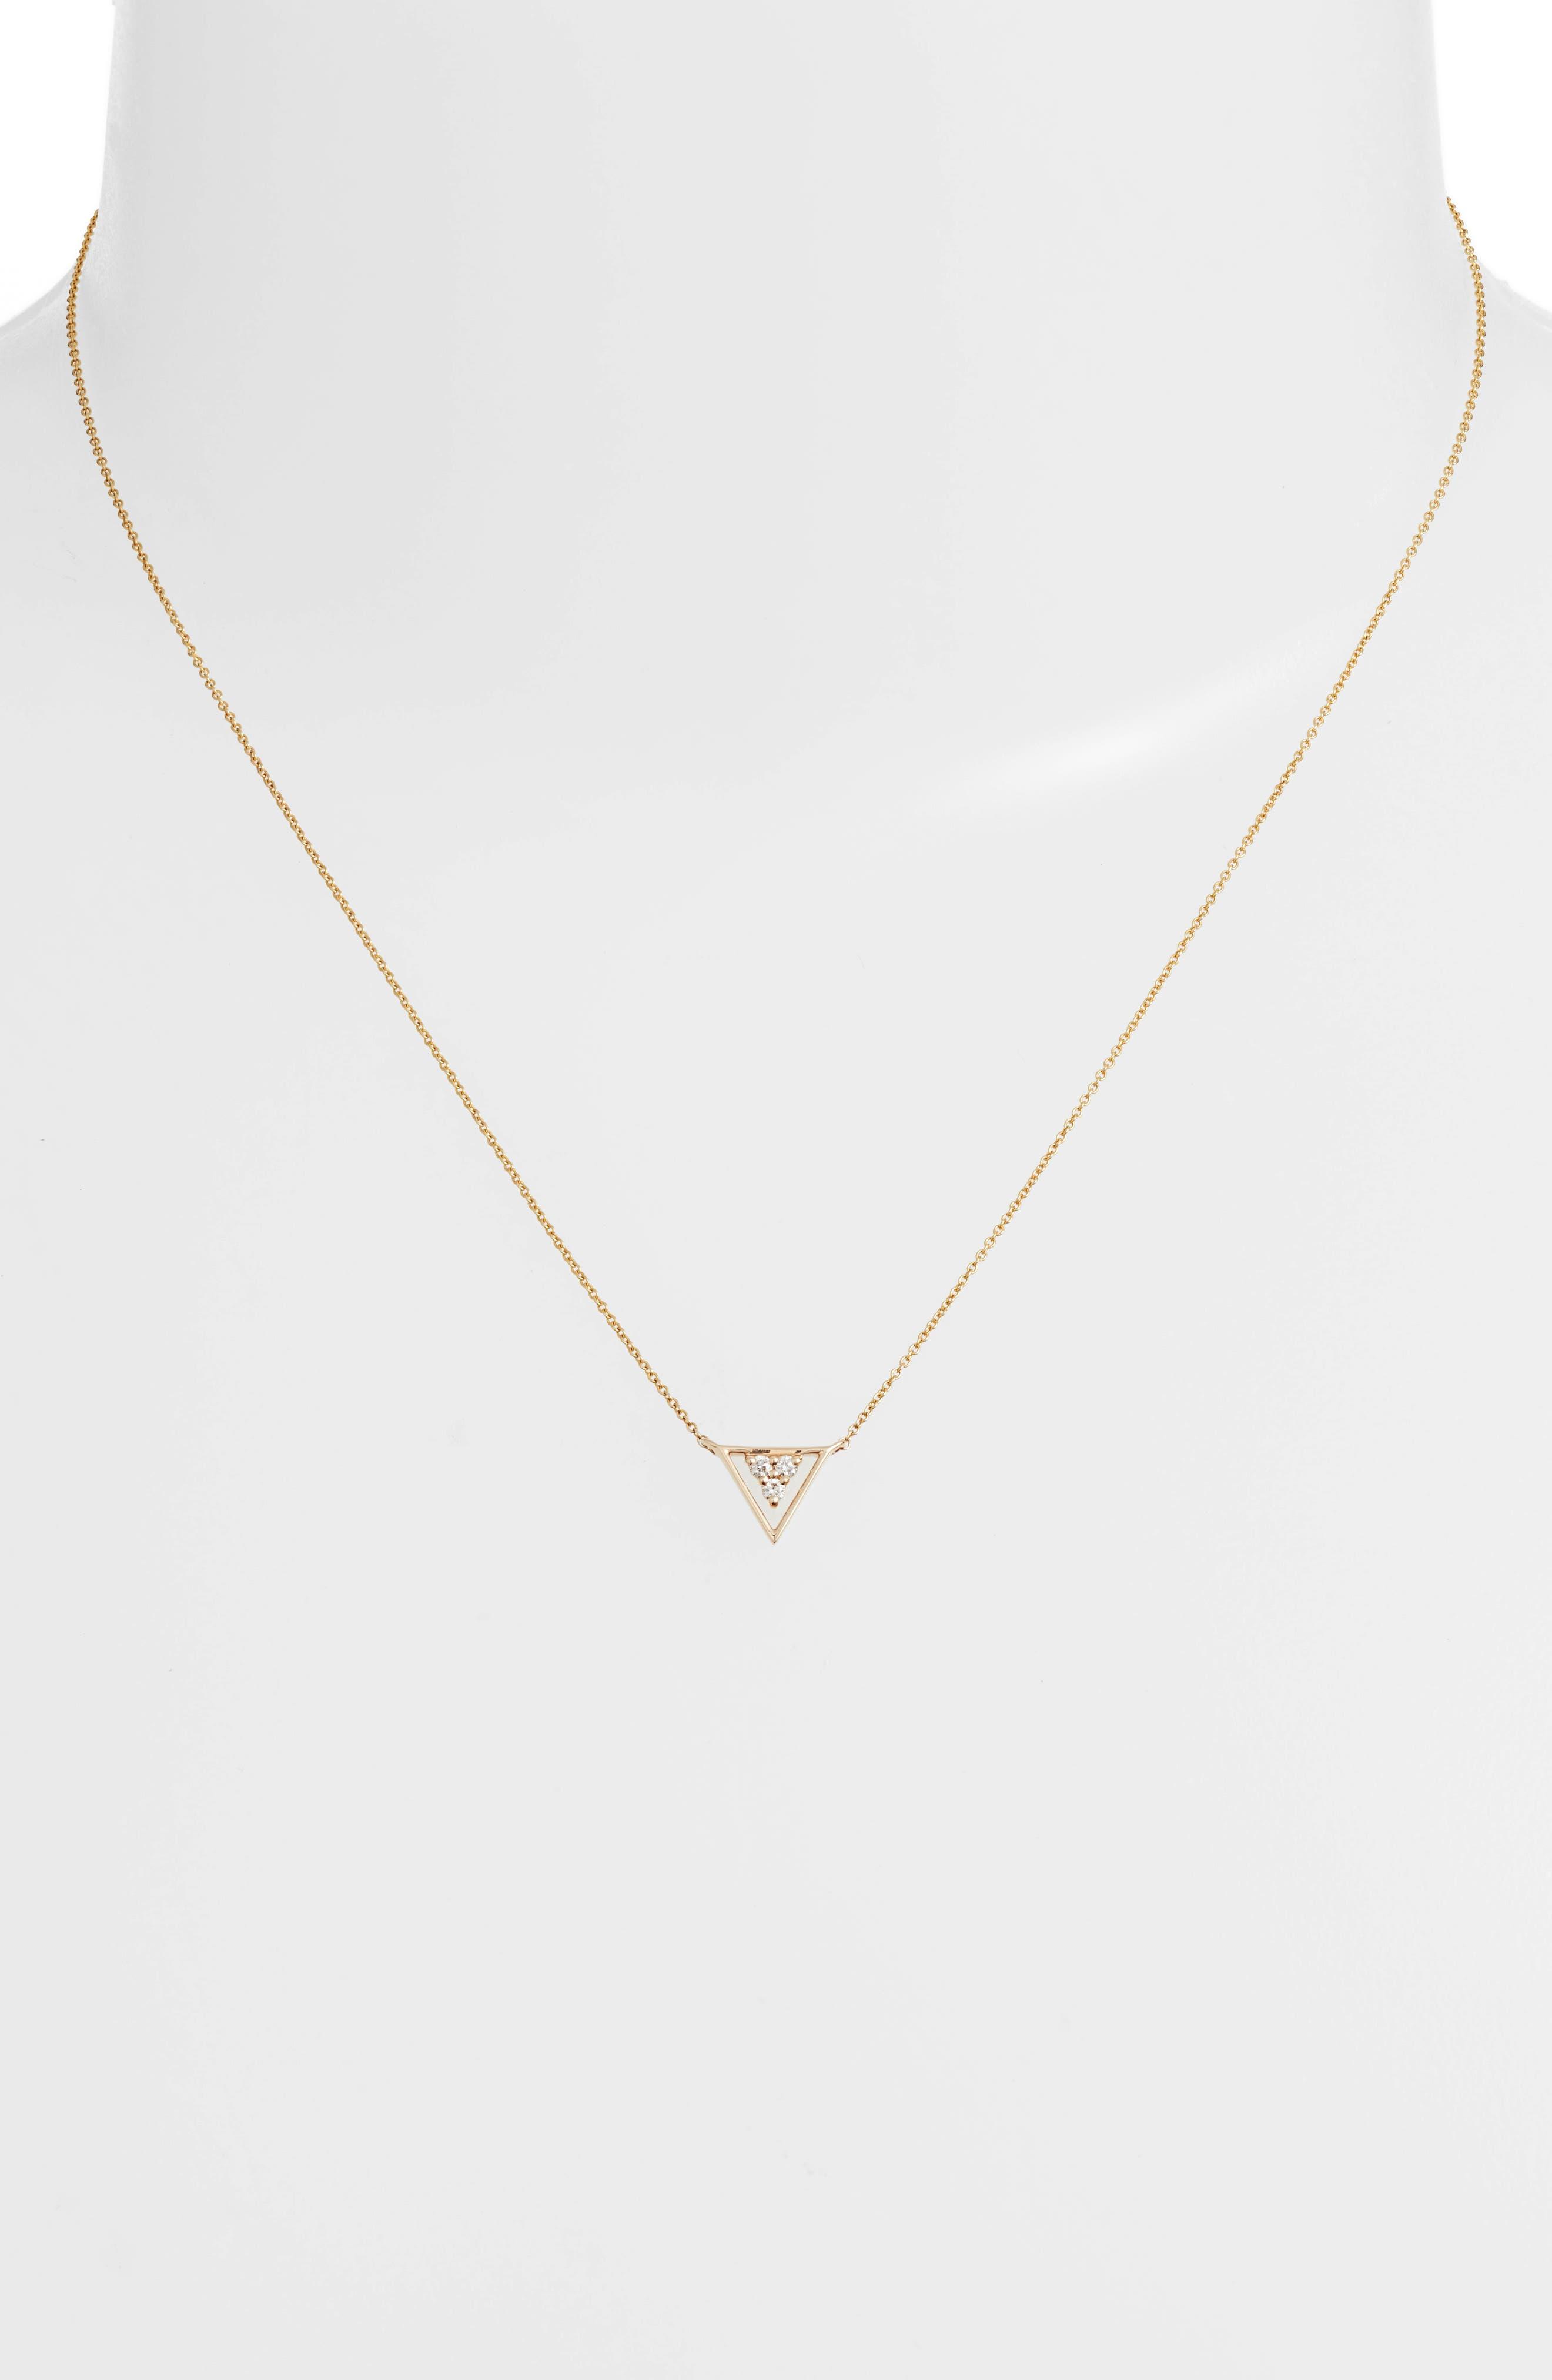 DANA REBECCA DESIGNS,                             Ivy Diamond Triangle Pendant Necklace,                             Alternate thumbnail 2, color,                             YELLOW GOLD/ PEARL